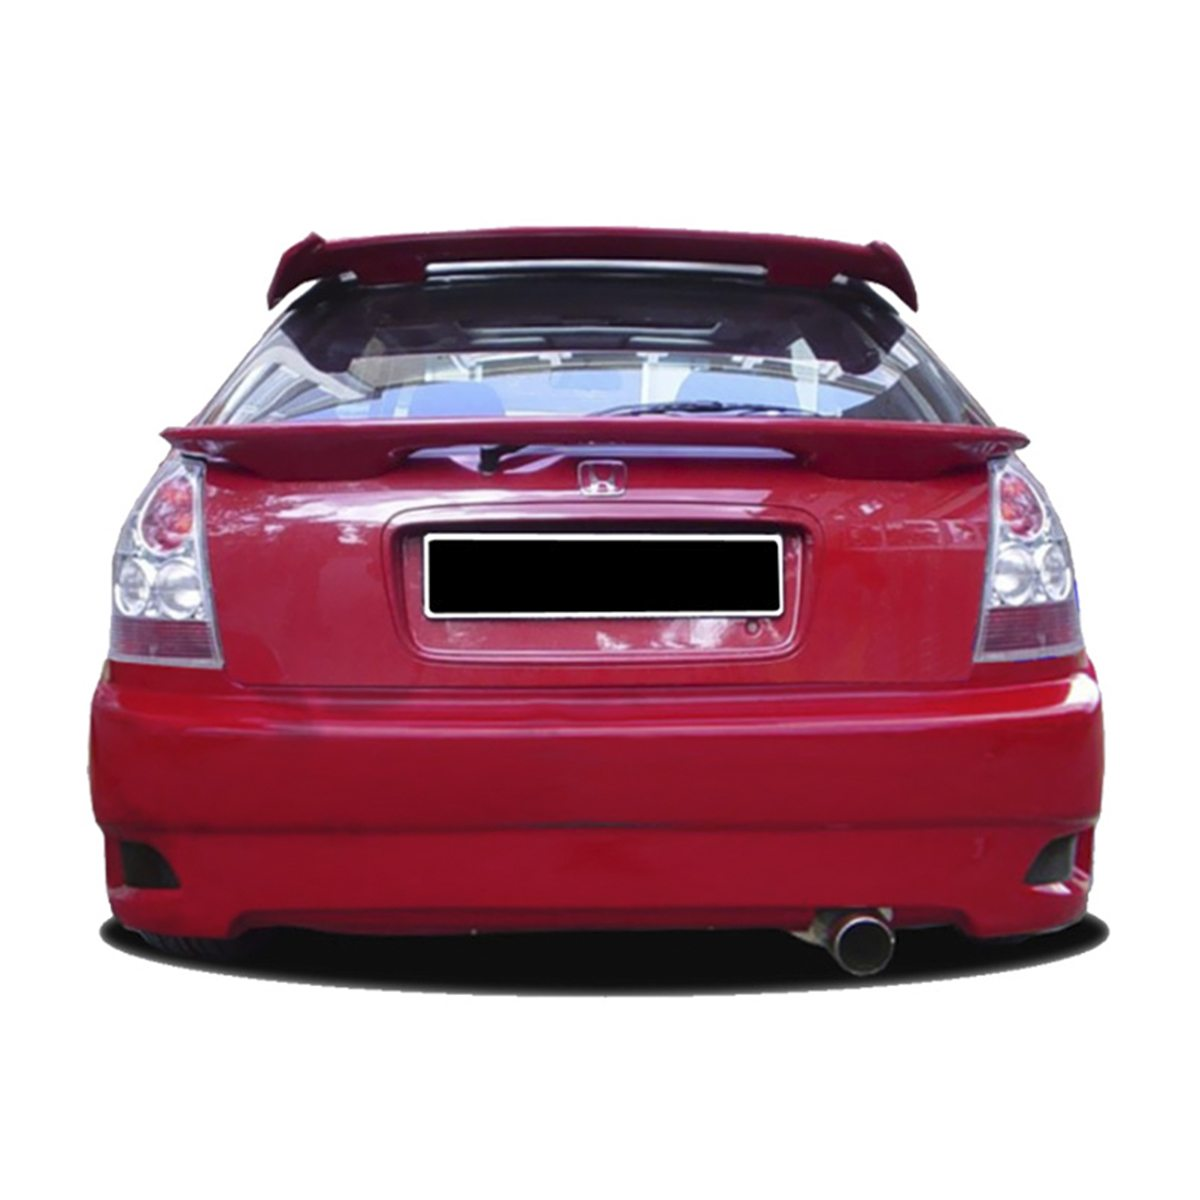 Honda-Civic-98-Hatchback-Twister-Tras-PCA043.1